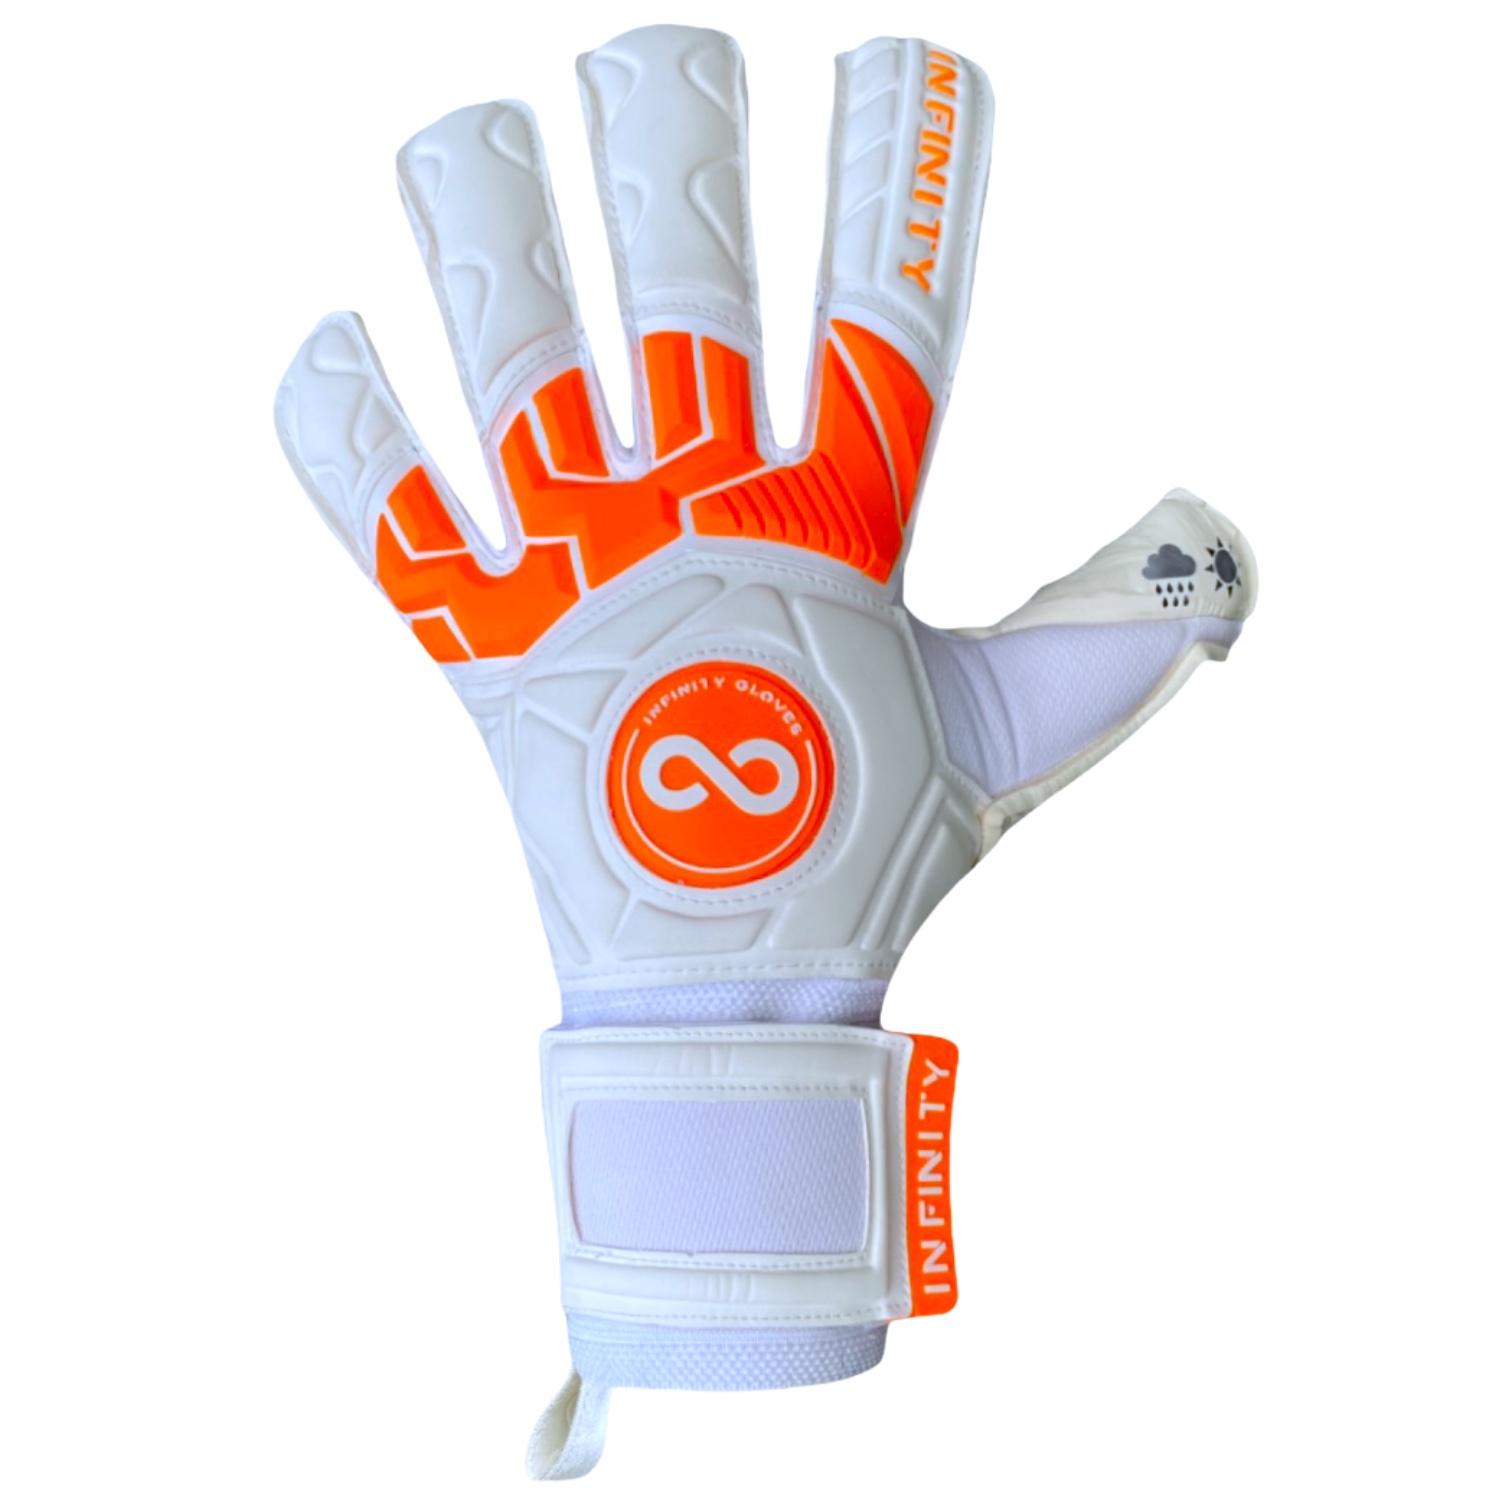 Luva Goleiro Profissional Infinity Pro Max Orange